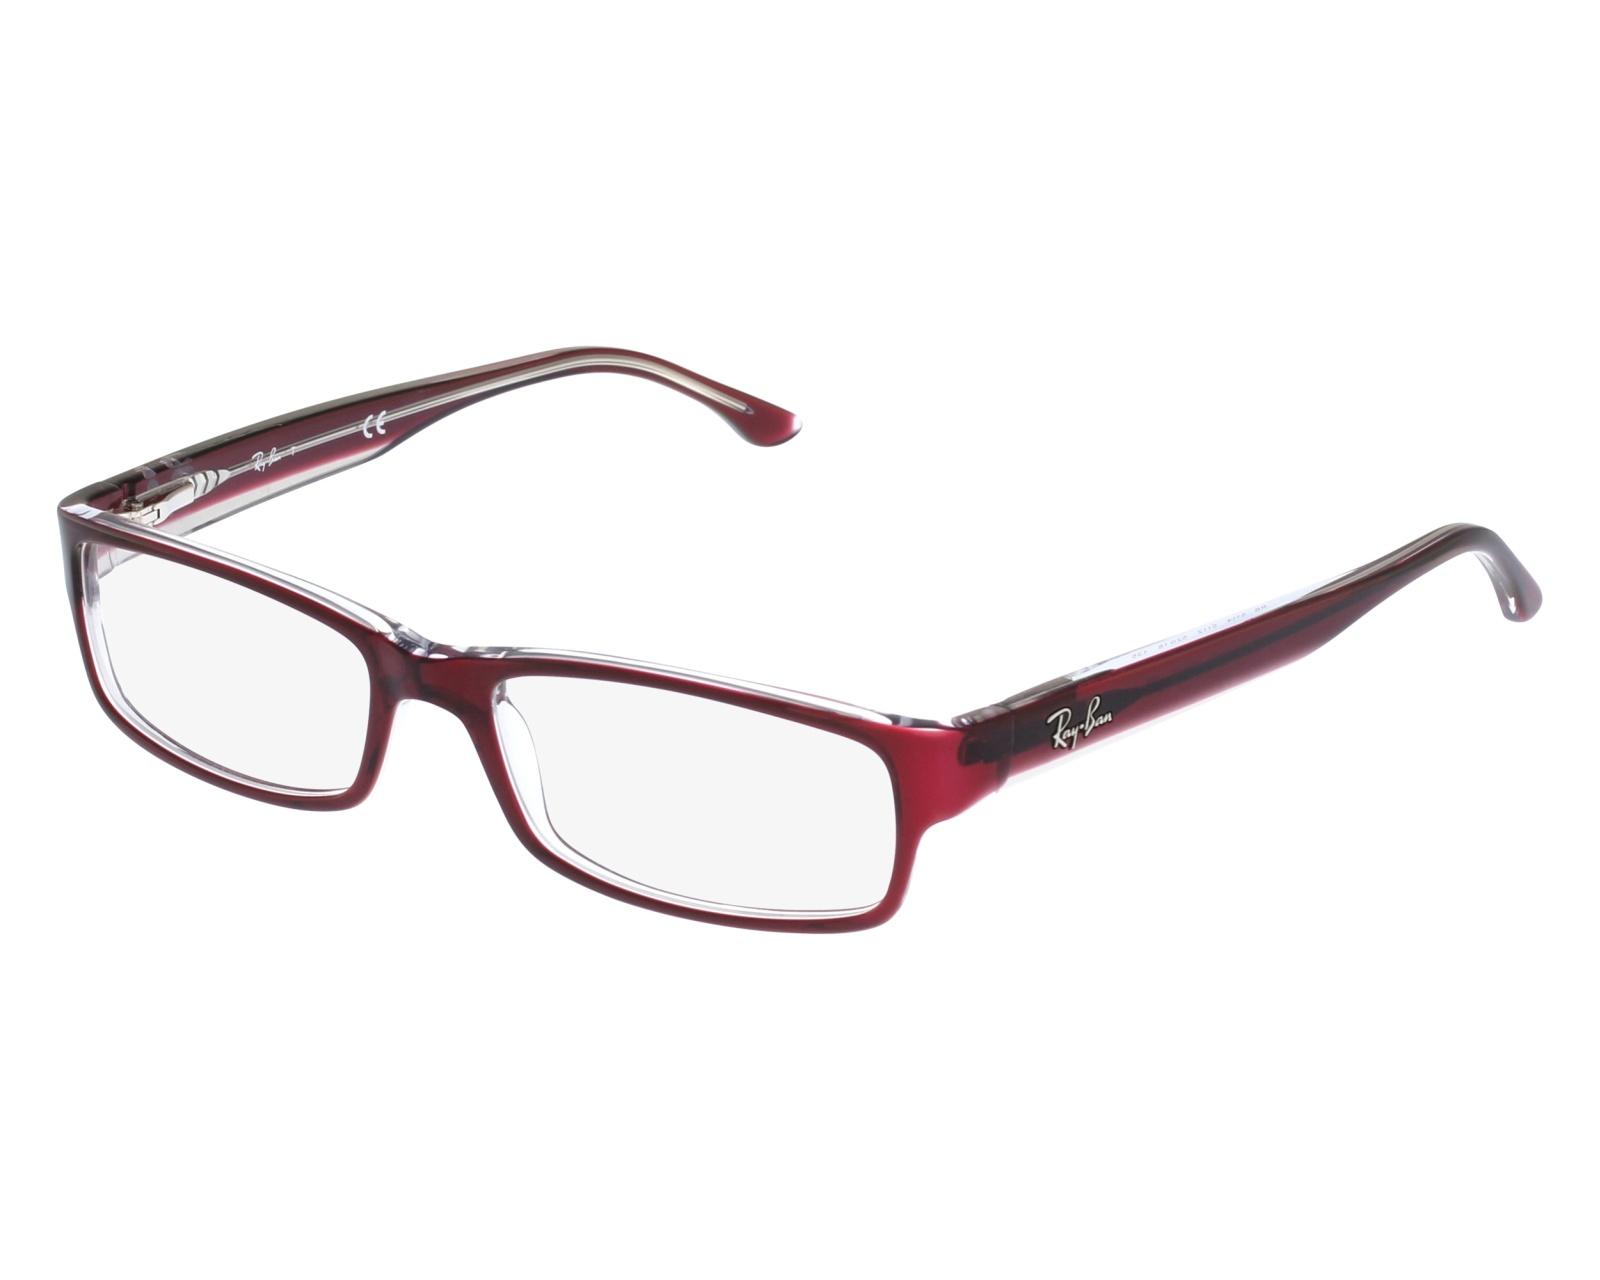 b0150f9134 Gafas Graduadas Ray-Ban RX-5114 5112 - Rojo vista de frente